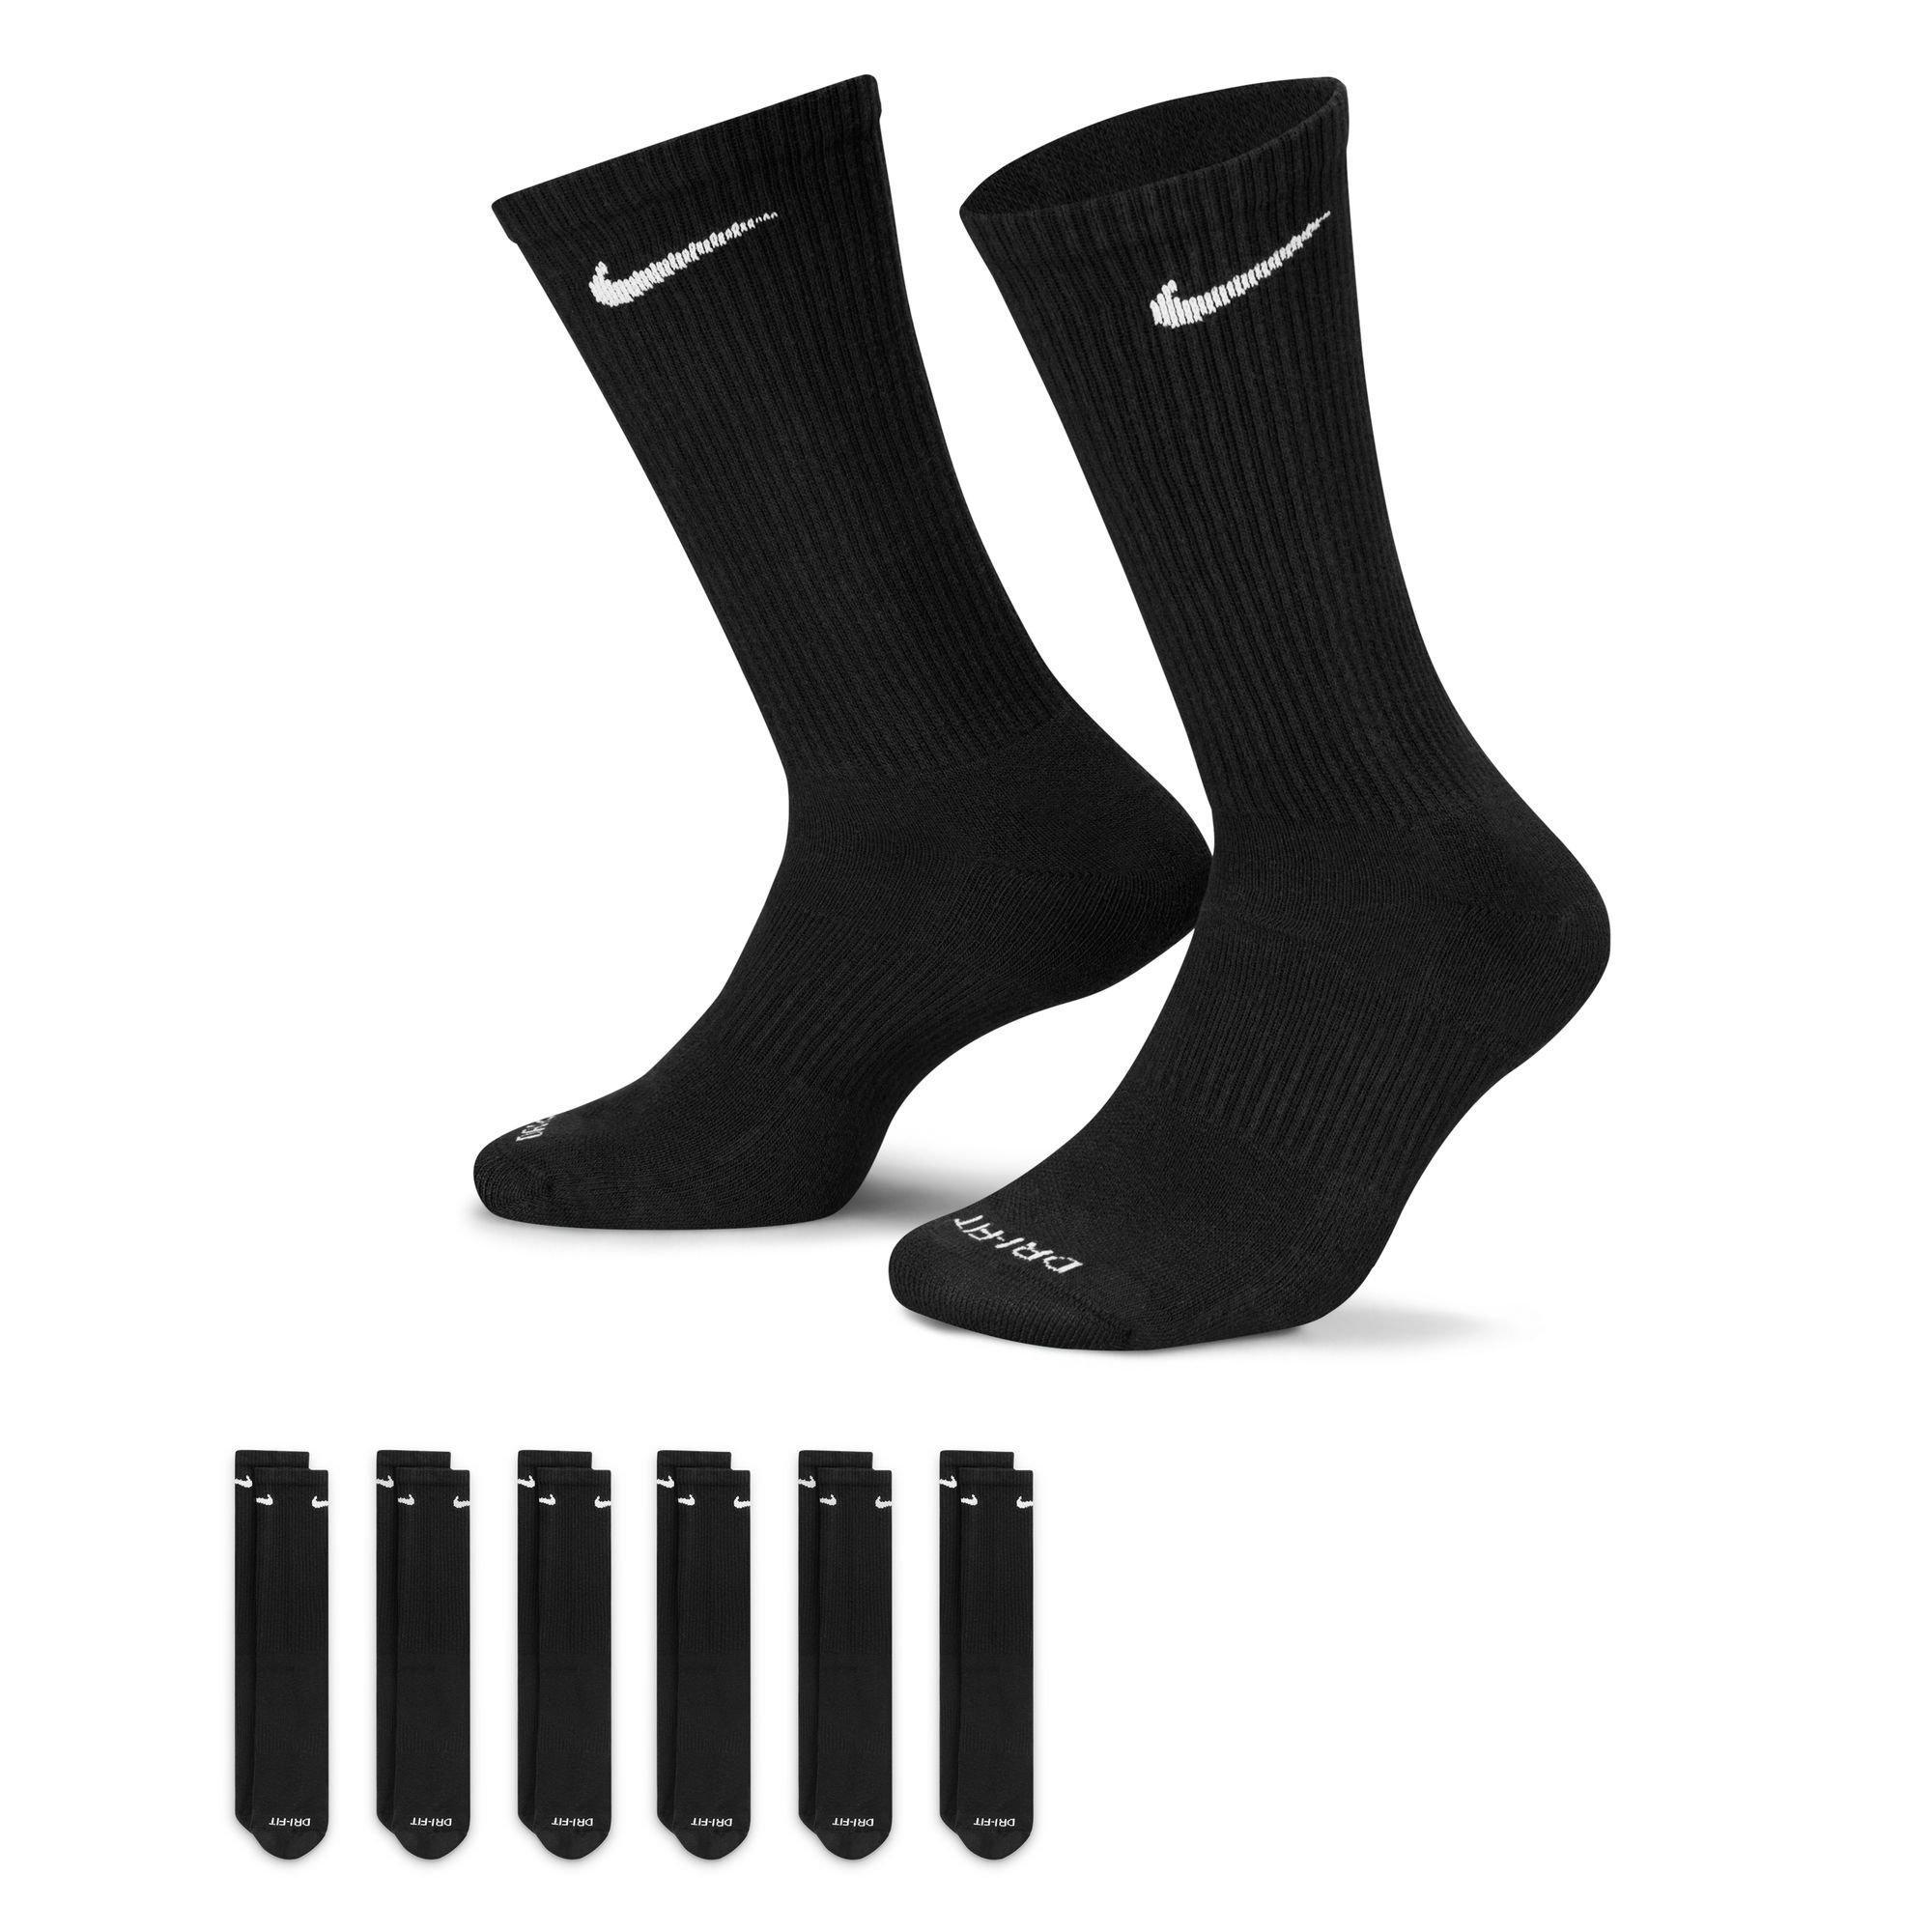 Nike Men's Everyday Plus Cushion Crew Training Socks - 6 Pairs